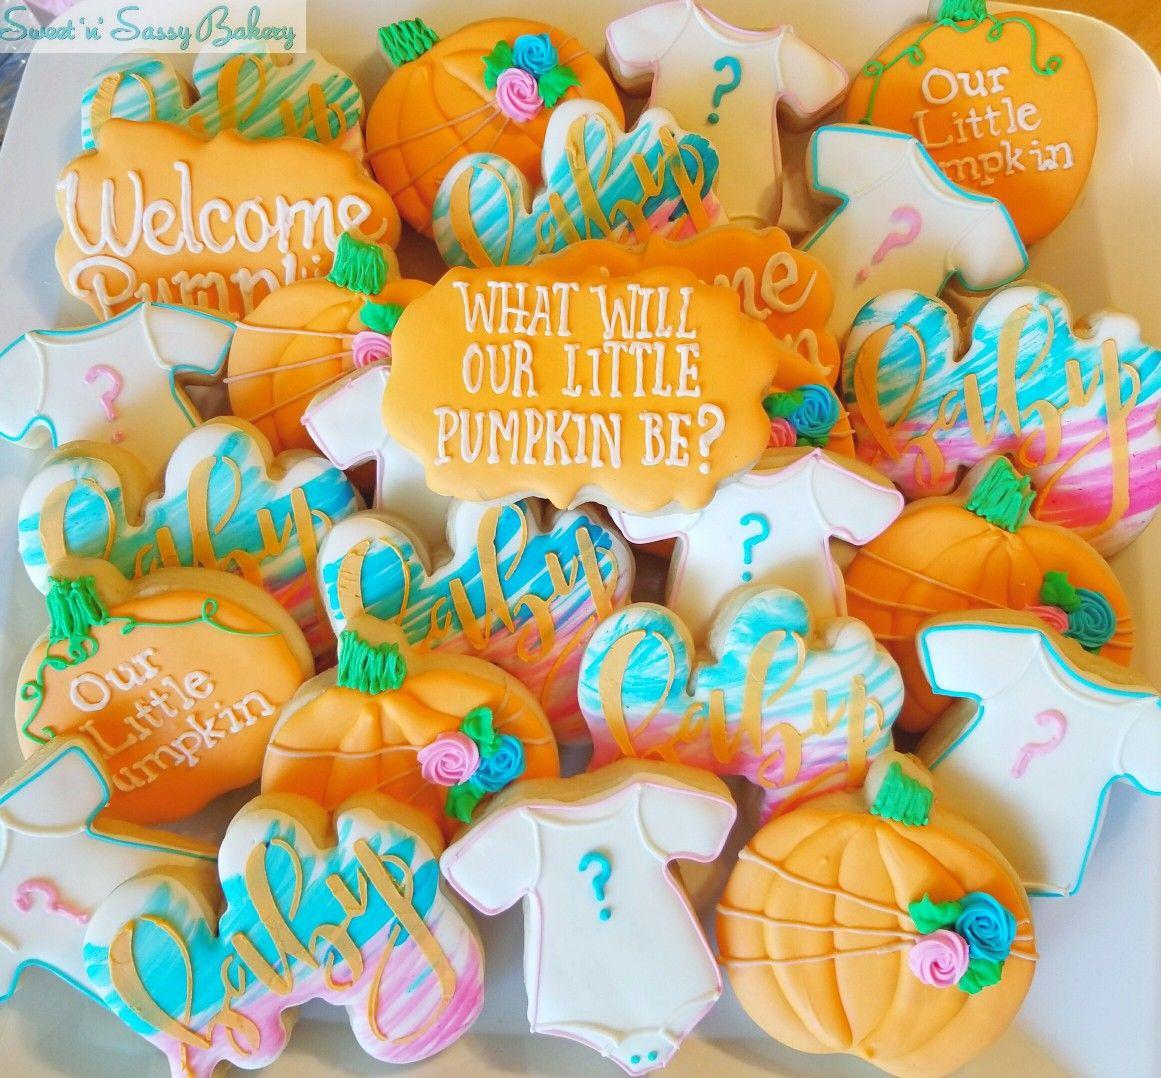 Pumpkin Gender Reveal Halloween Gender Reveal Pumpkin Gender Reveal Gender Reveal